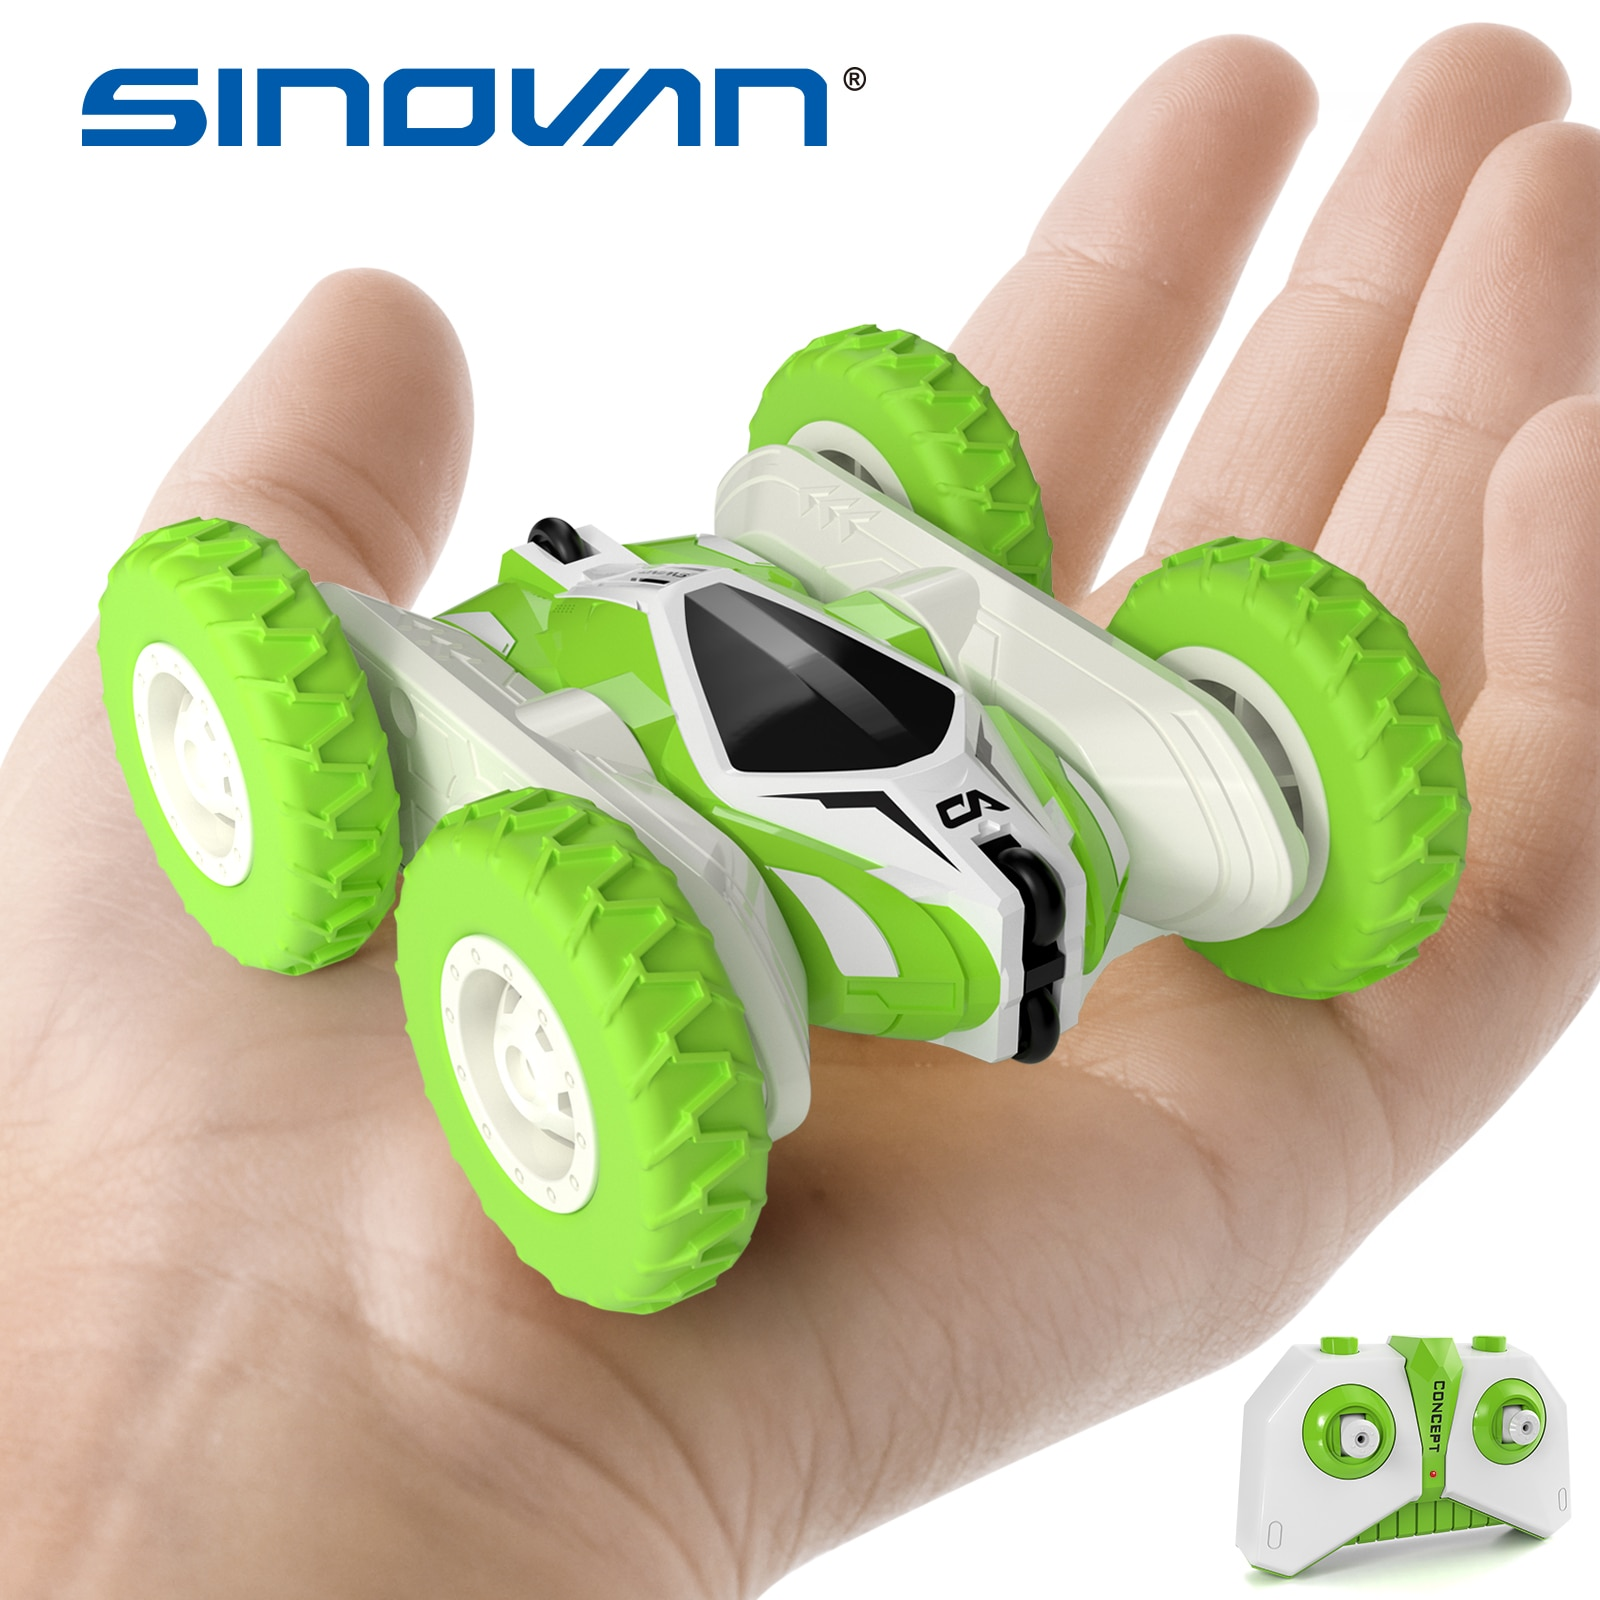 Sinovan Hugine RC Car 2.4G 4CH Stunt Drift Deformation Buggy Car Remote control Roll Car 360 Degree Flip Kids Robot RC Cars Toys